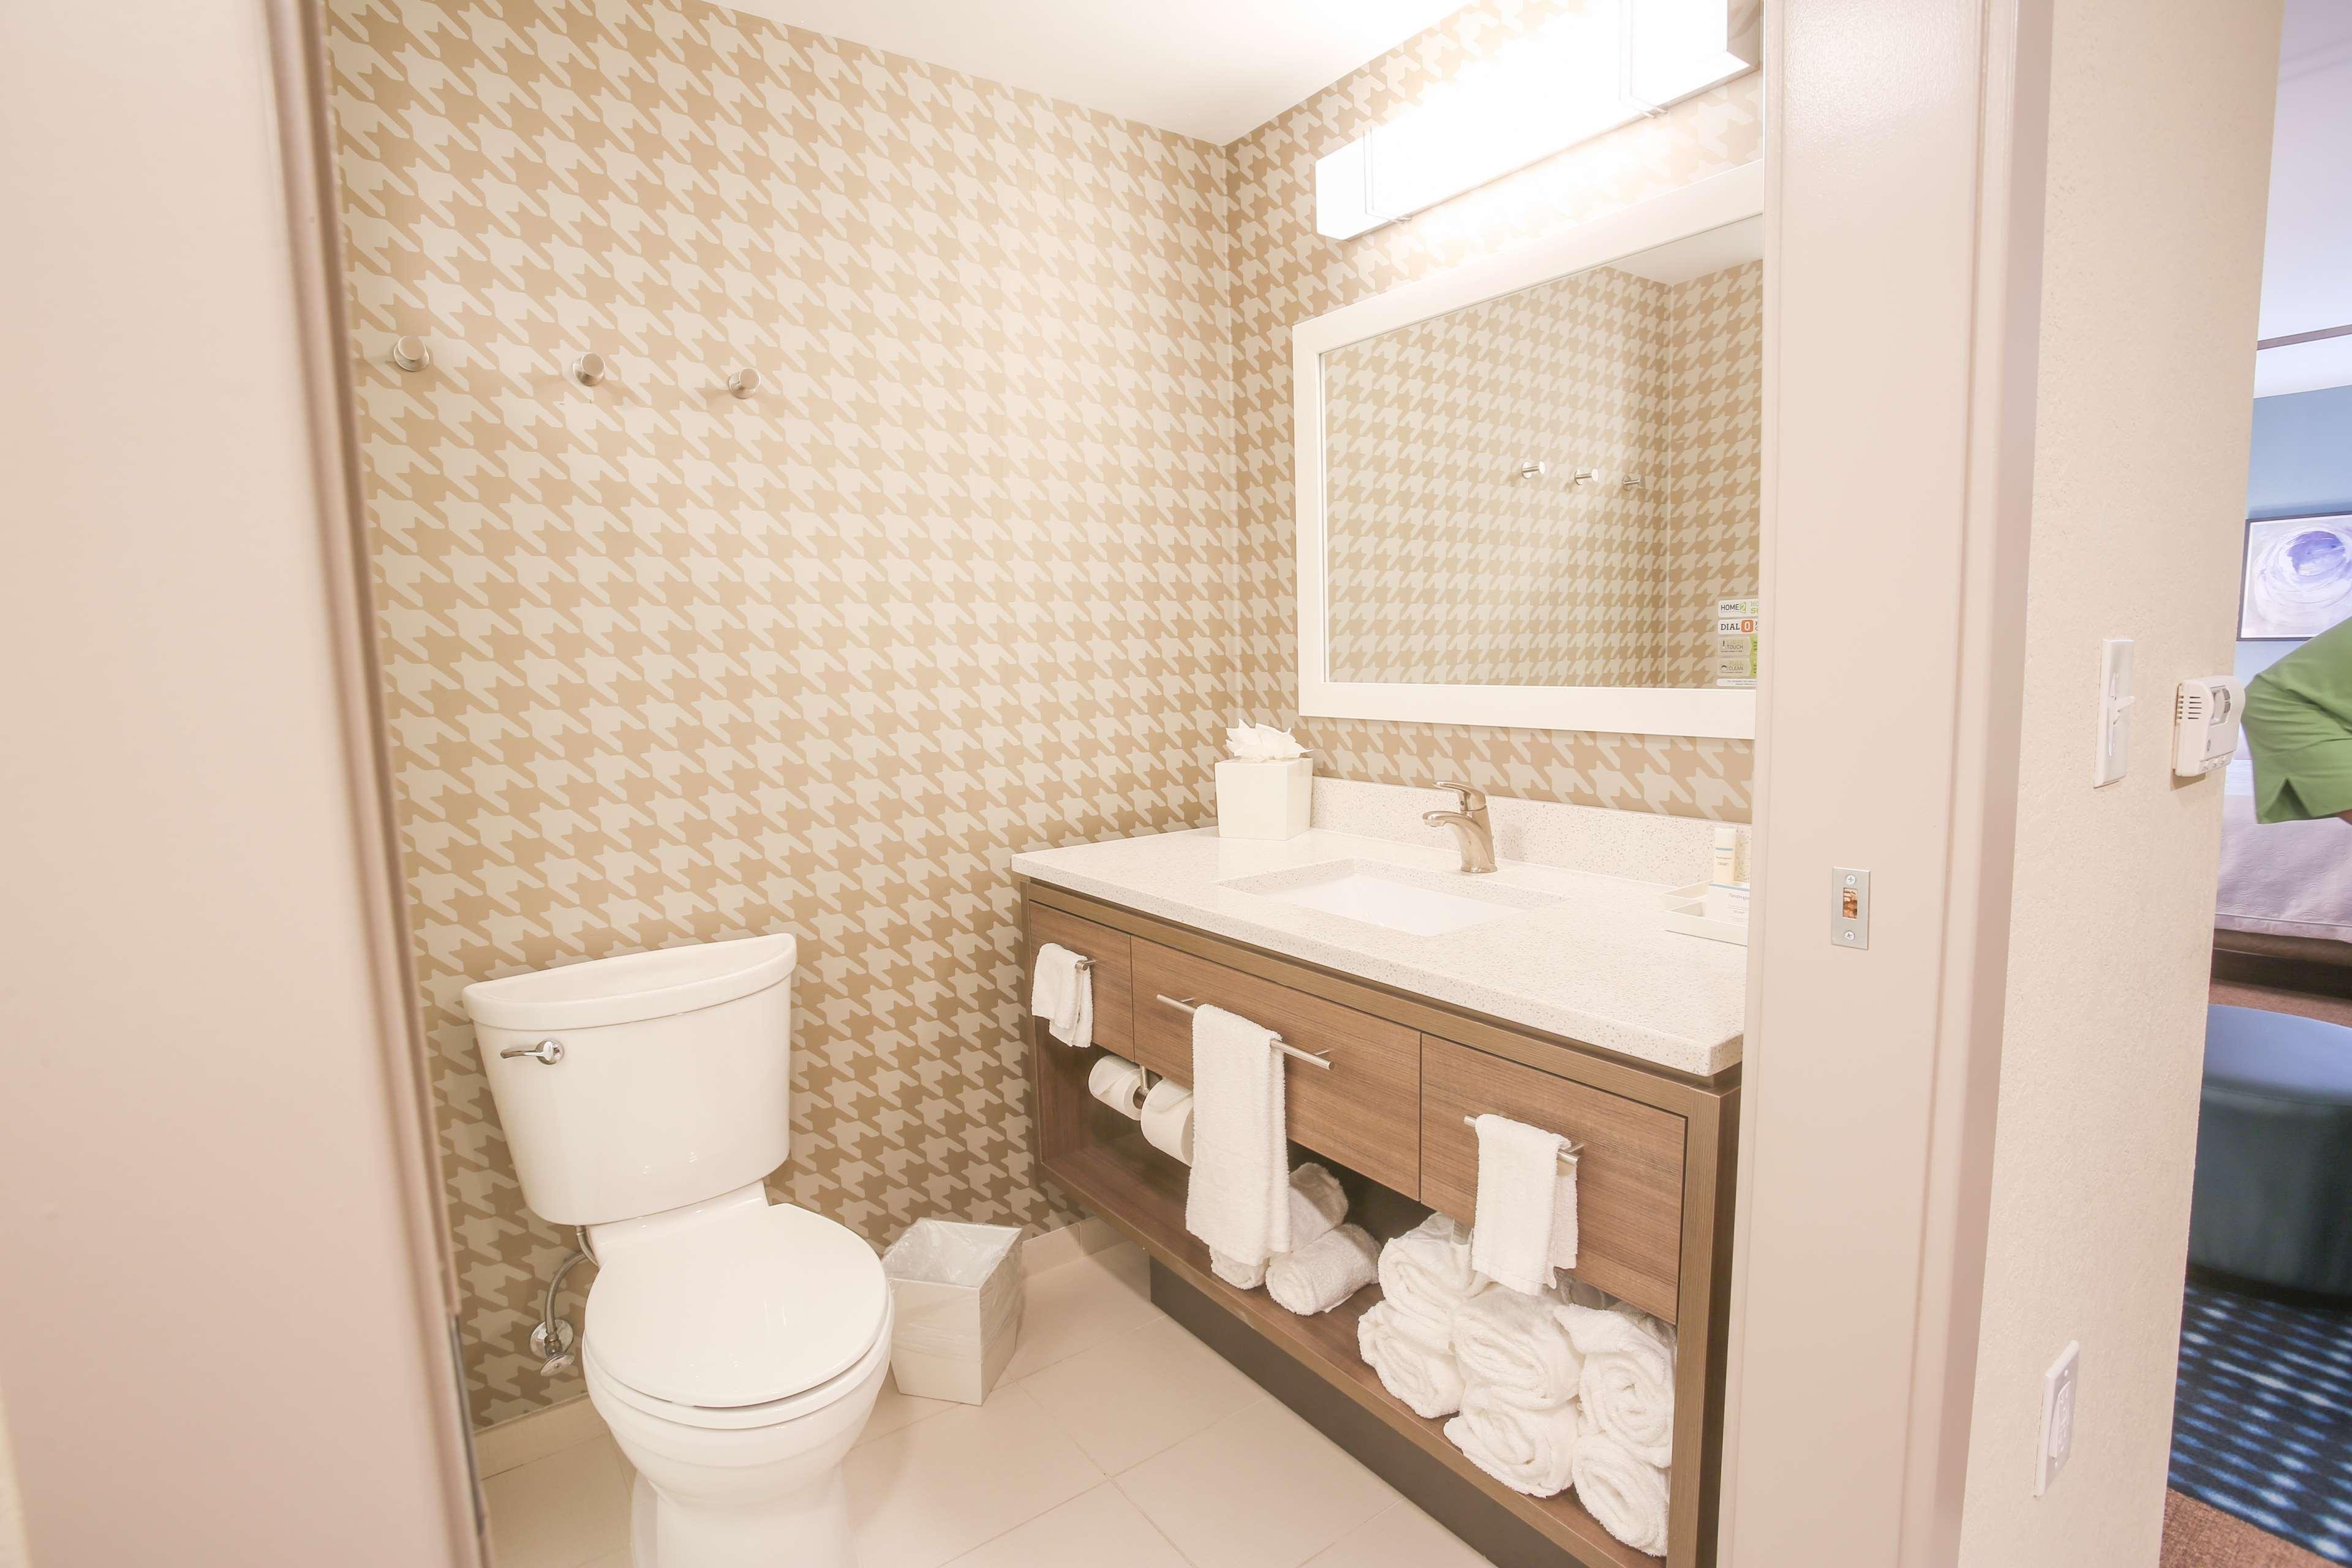 Home2 Suites by Hilton Bordentown image 28